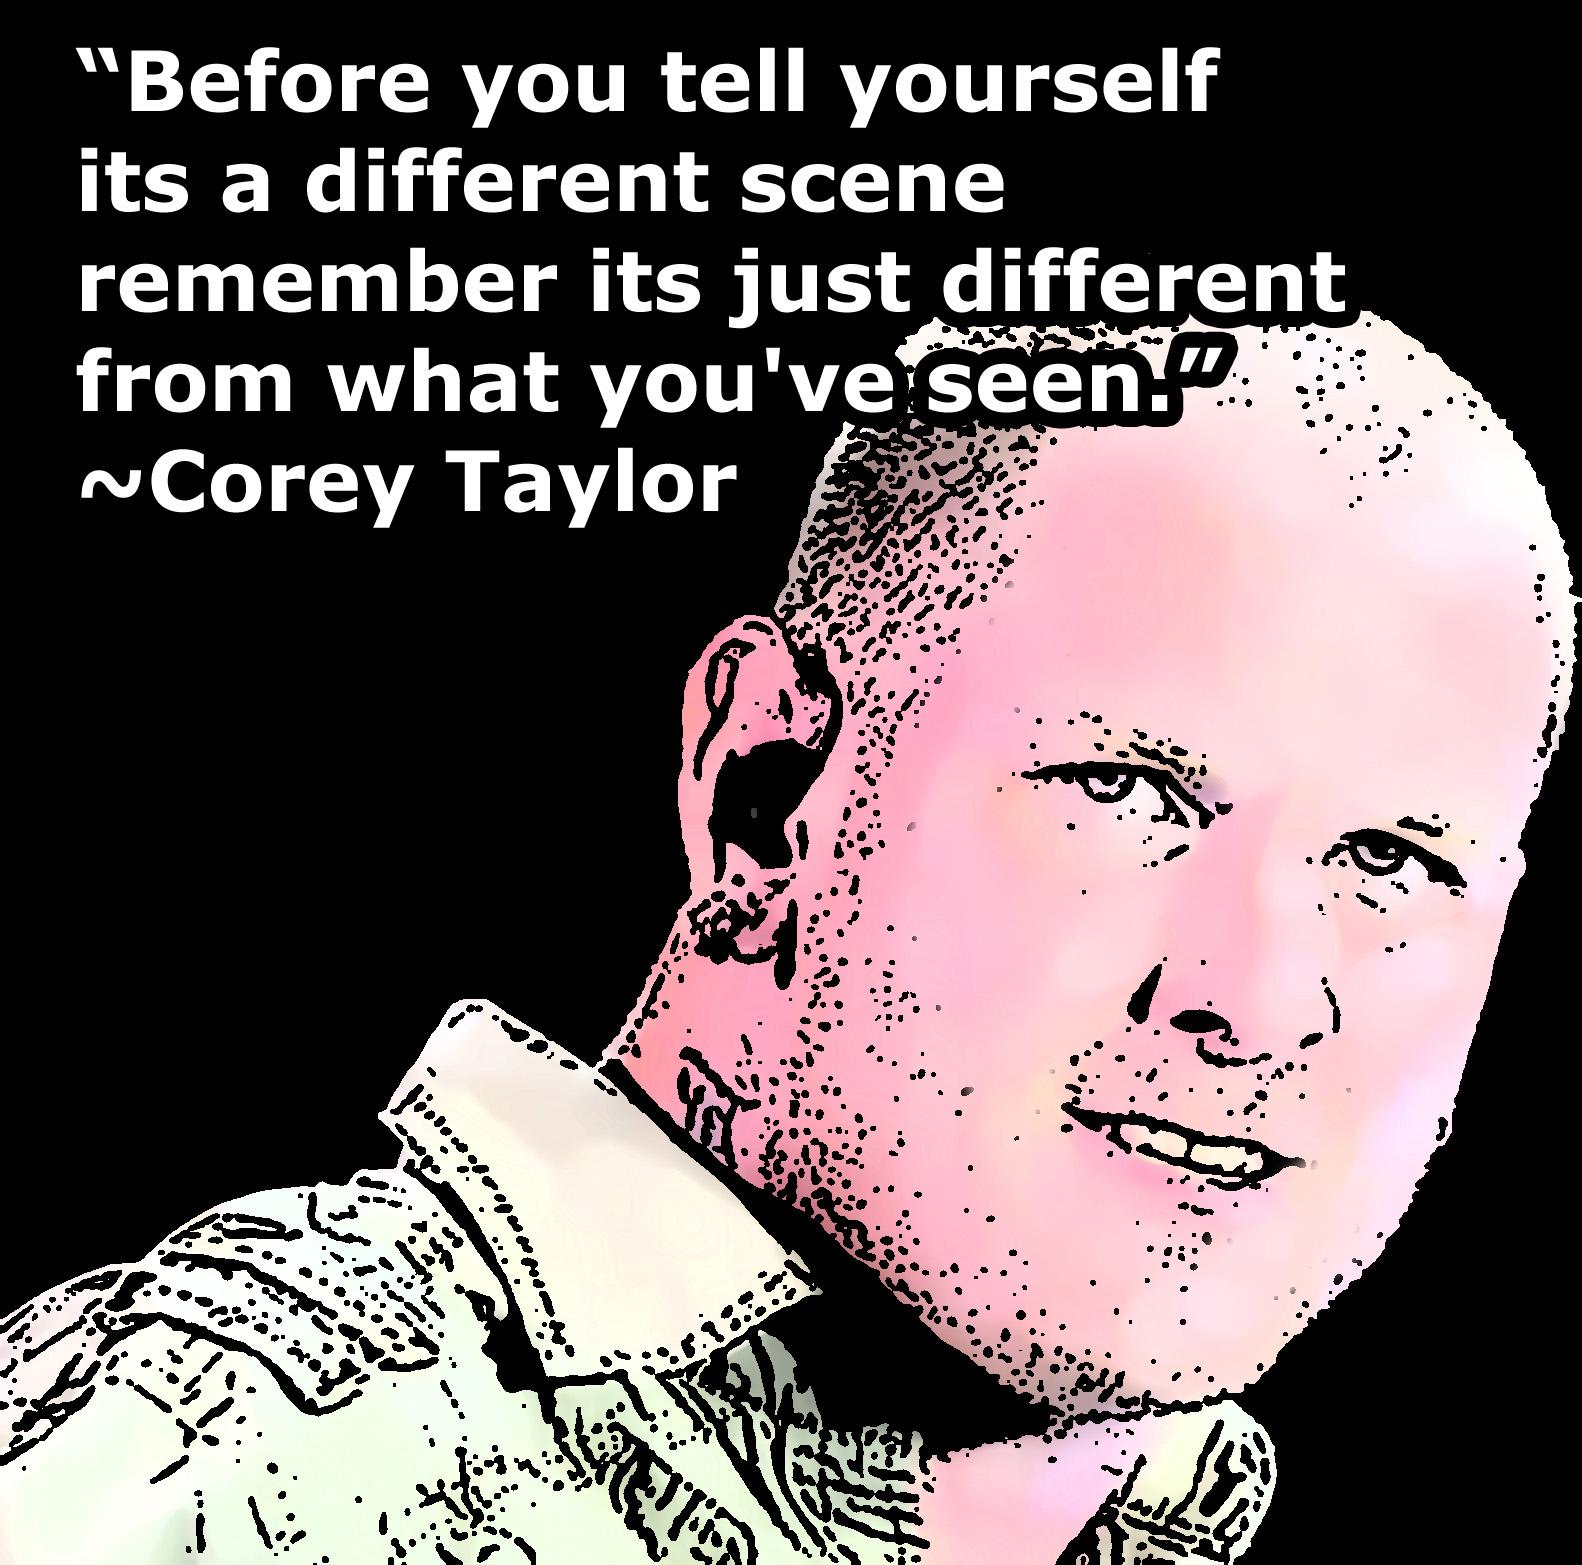 http://2.bp.blogspot.com/-mQ3h5Ll5Vvk/T_q0yg4u9oI/AAAAAAAAAJU/TtNjw8Fpsjg/s1600/Corey+Taylor.jpg